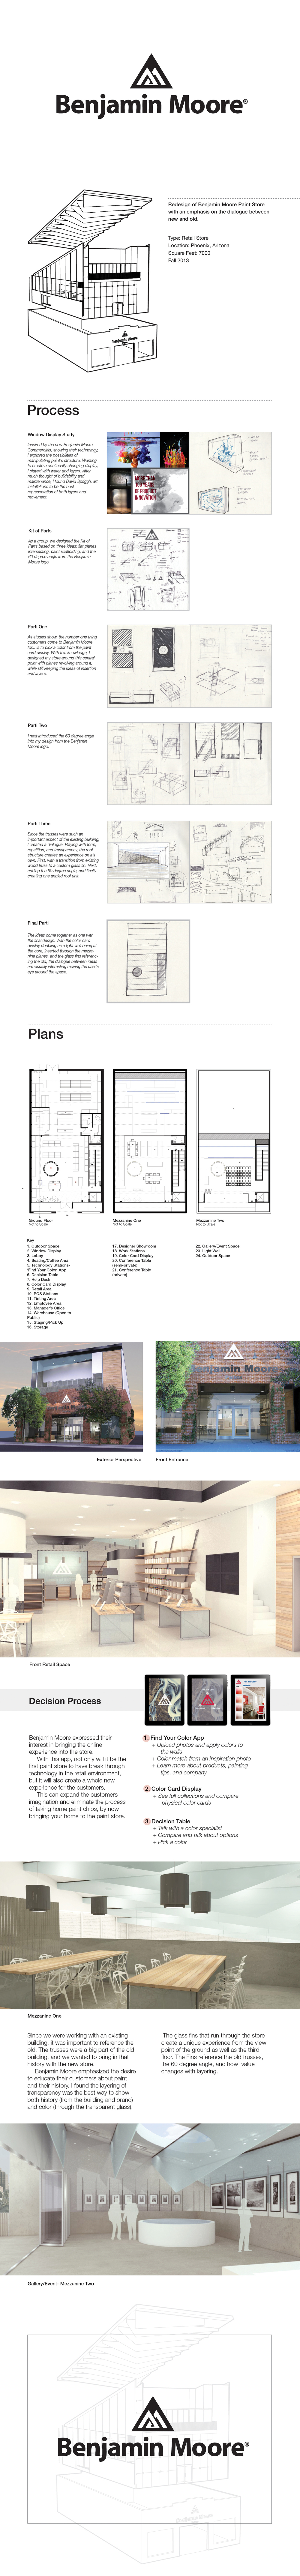 Design Excellence 3-01.jpg